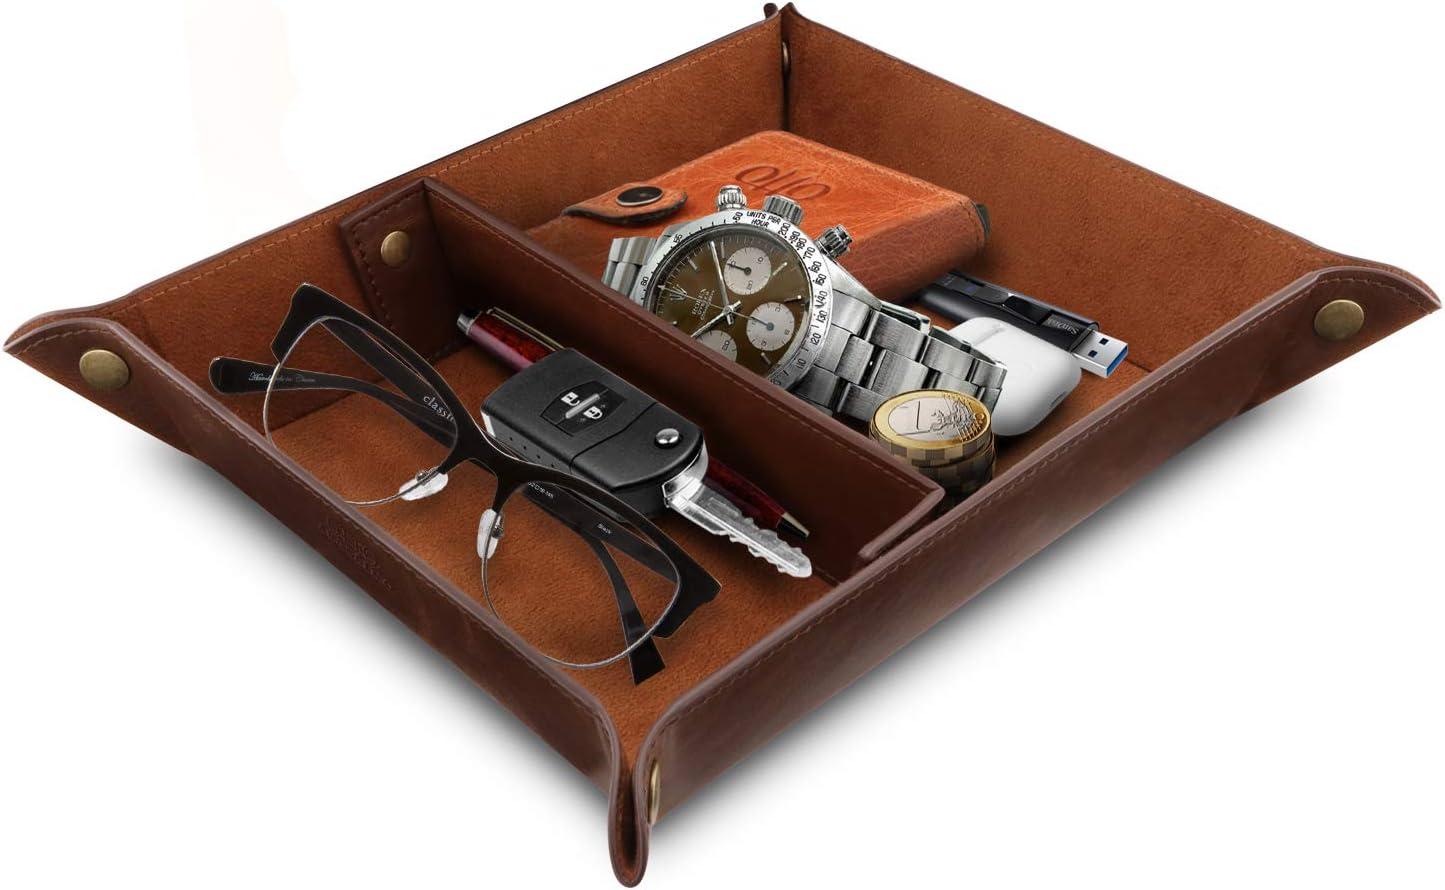 Londo Leather Organizer Office Desk Tray